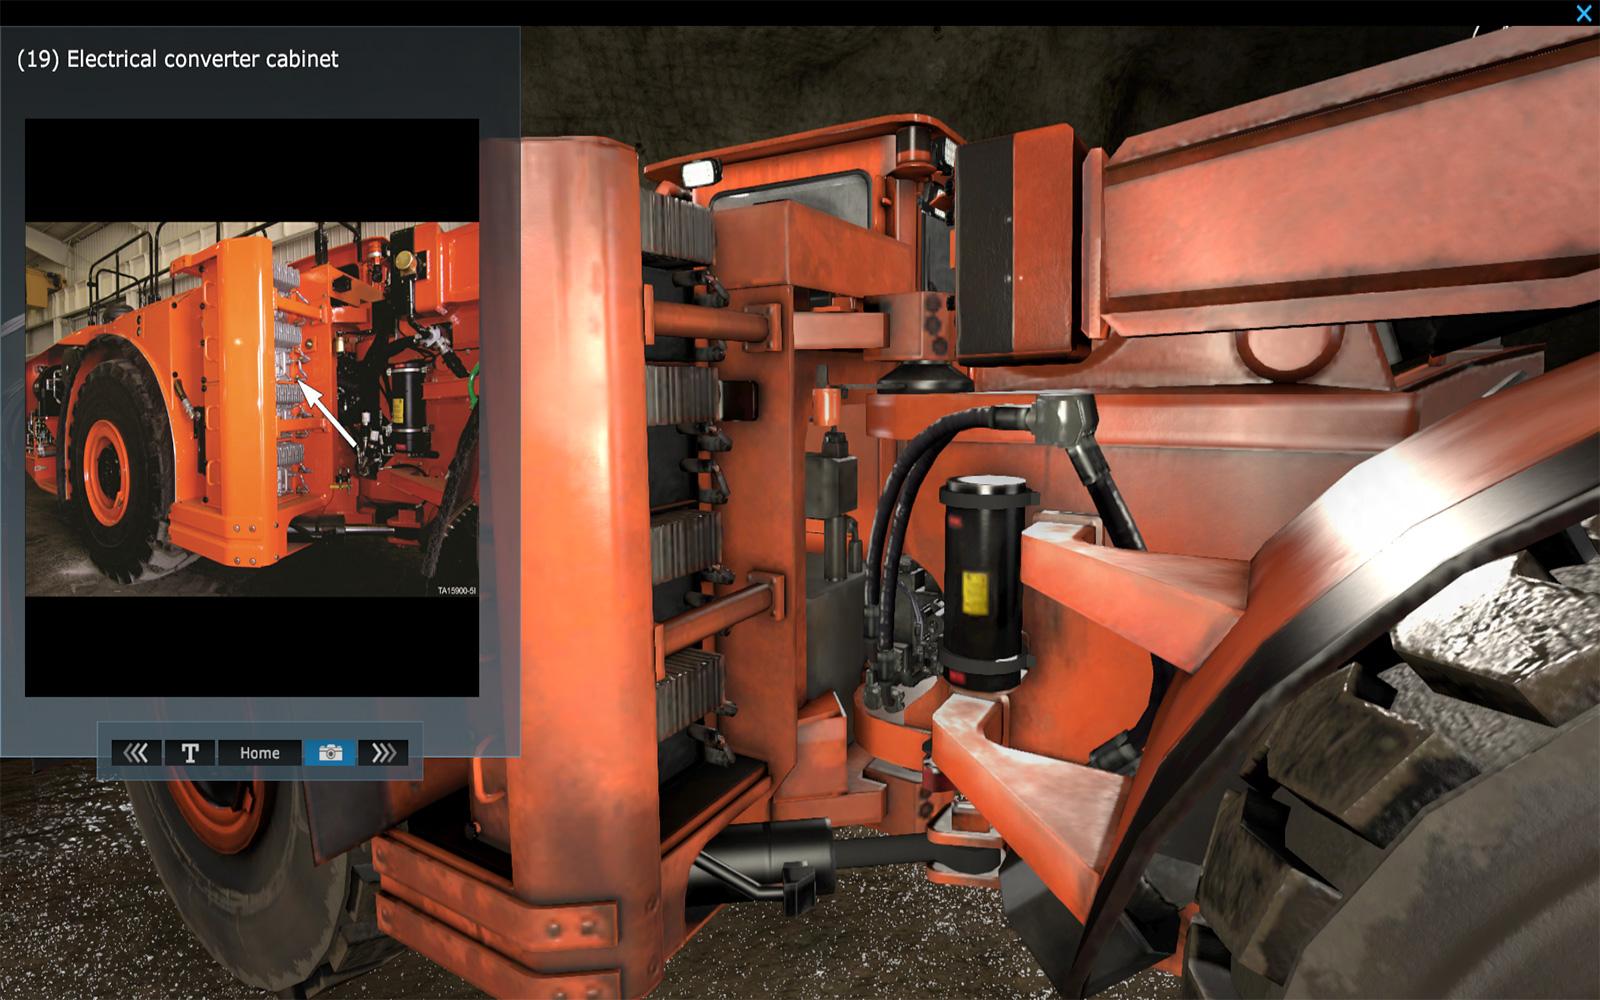 Simulation-Based Training Tutorial for Equipment Maintenance